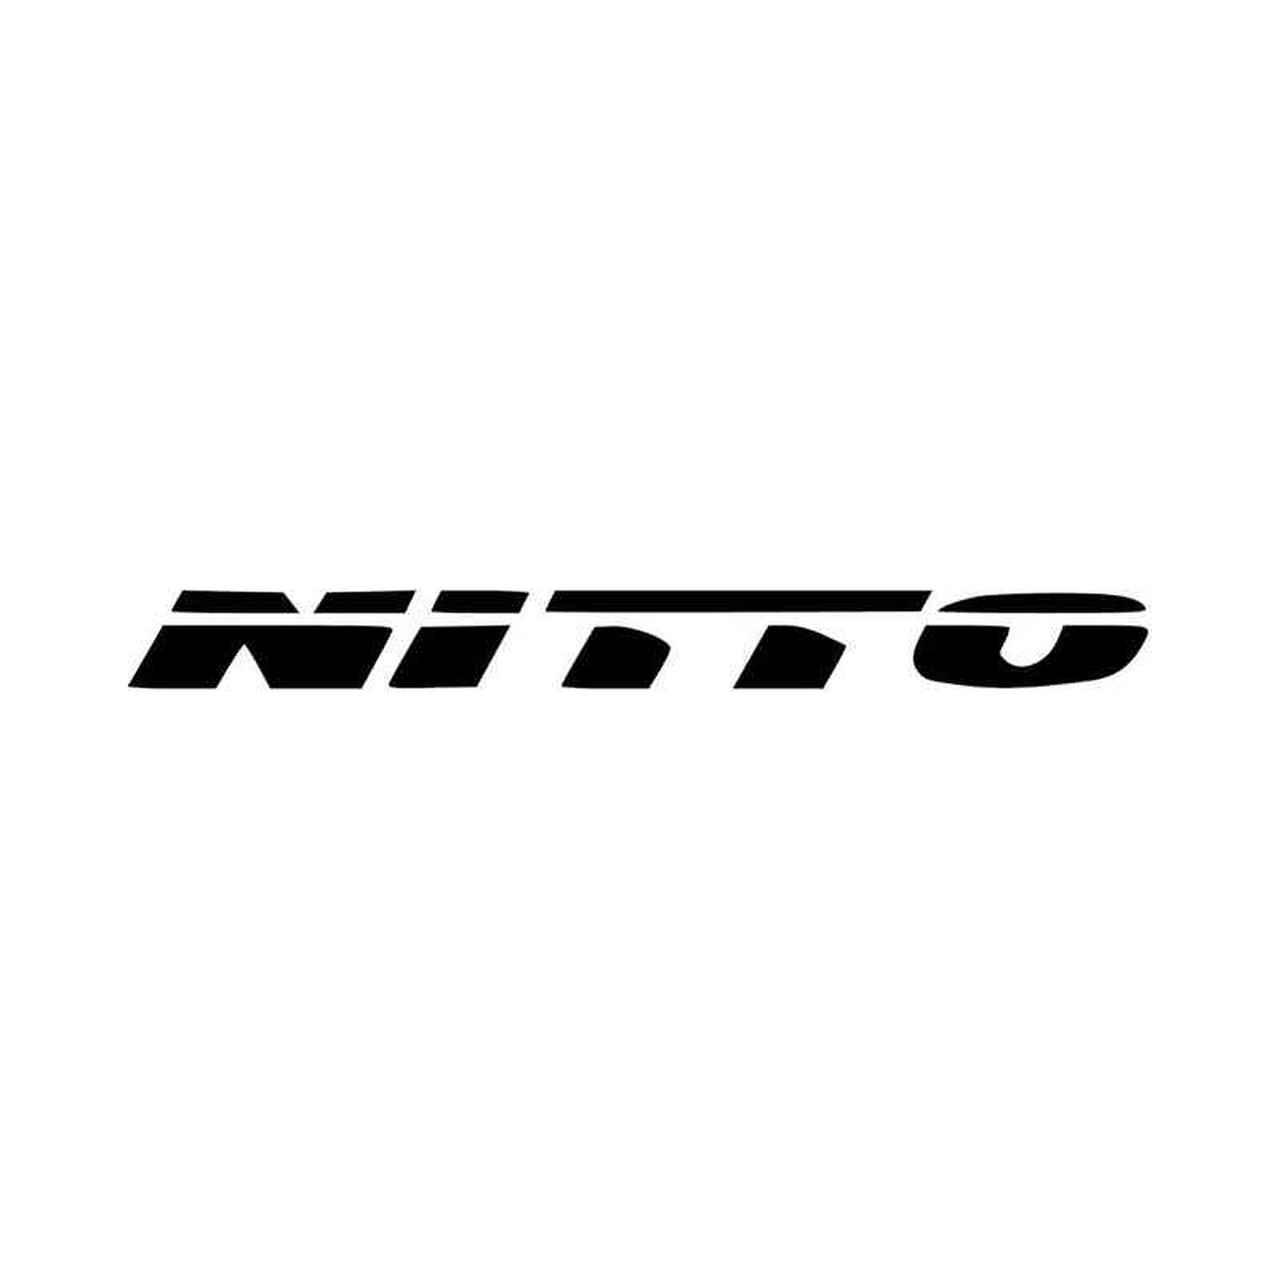 Nitto Tires Vinyl Decal Sticker.